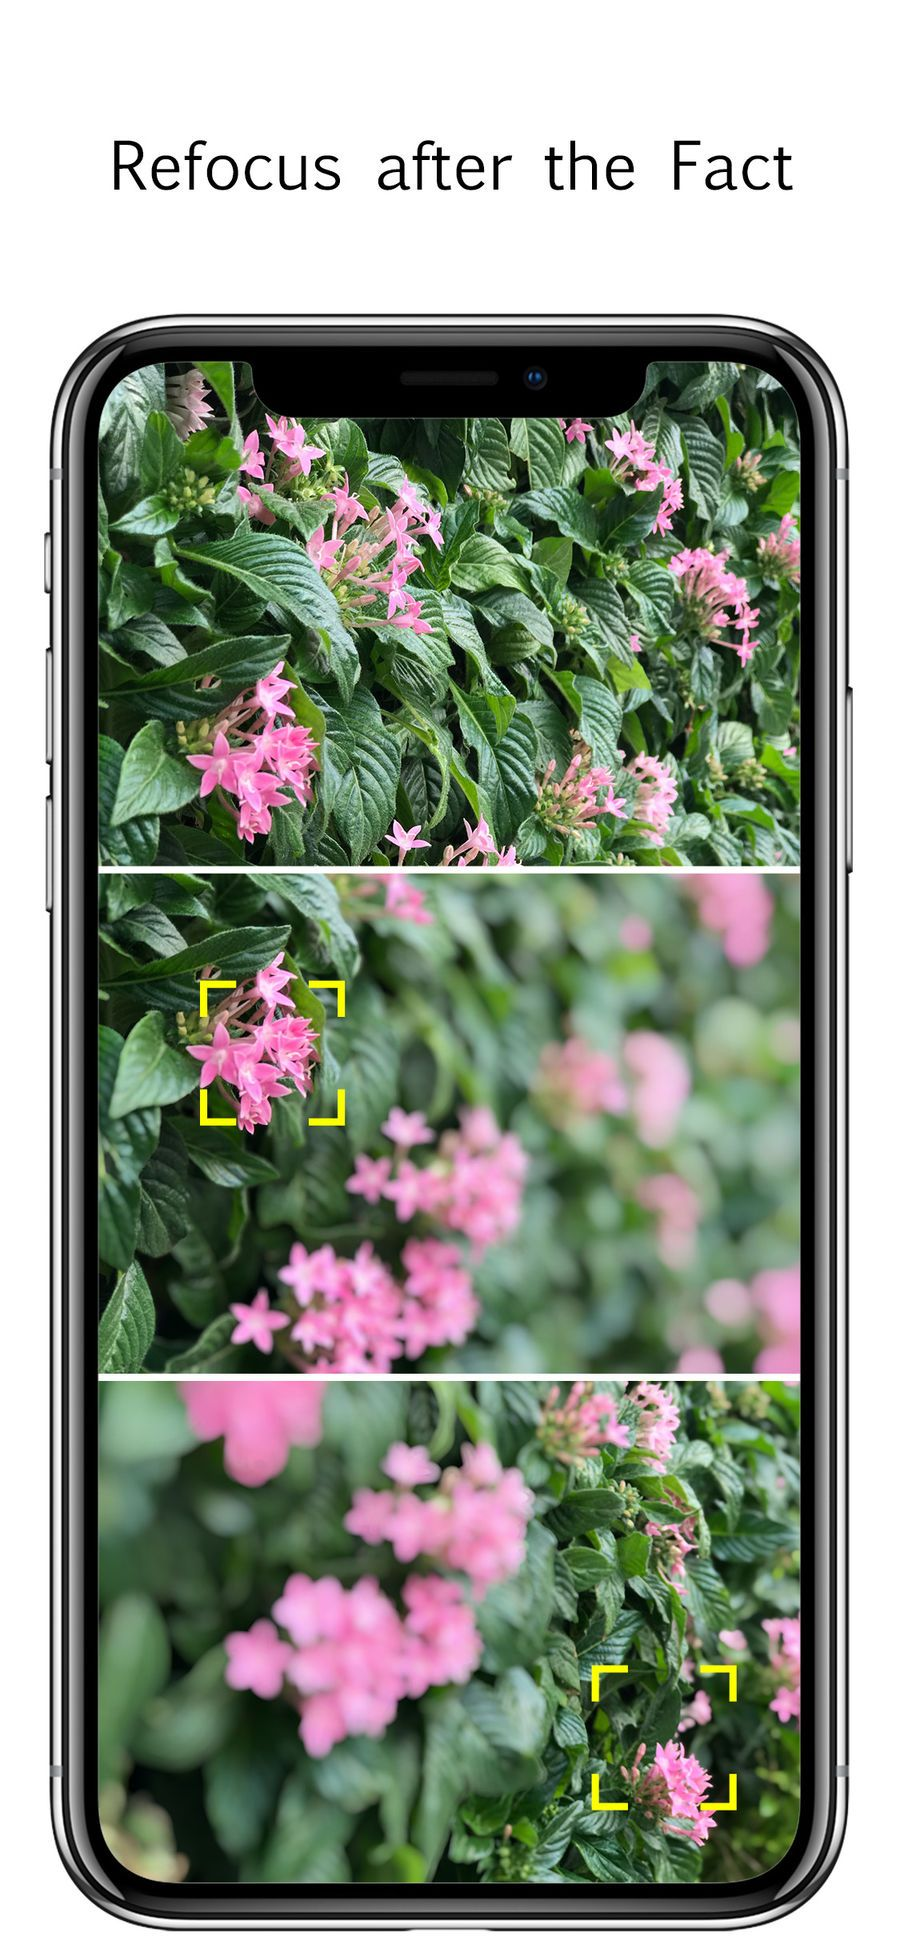 Focos Video Amp Apps Ios Herbs